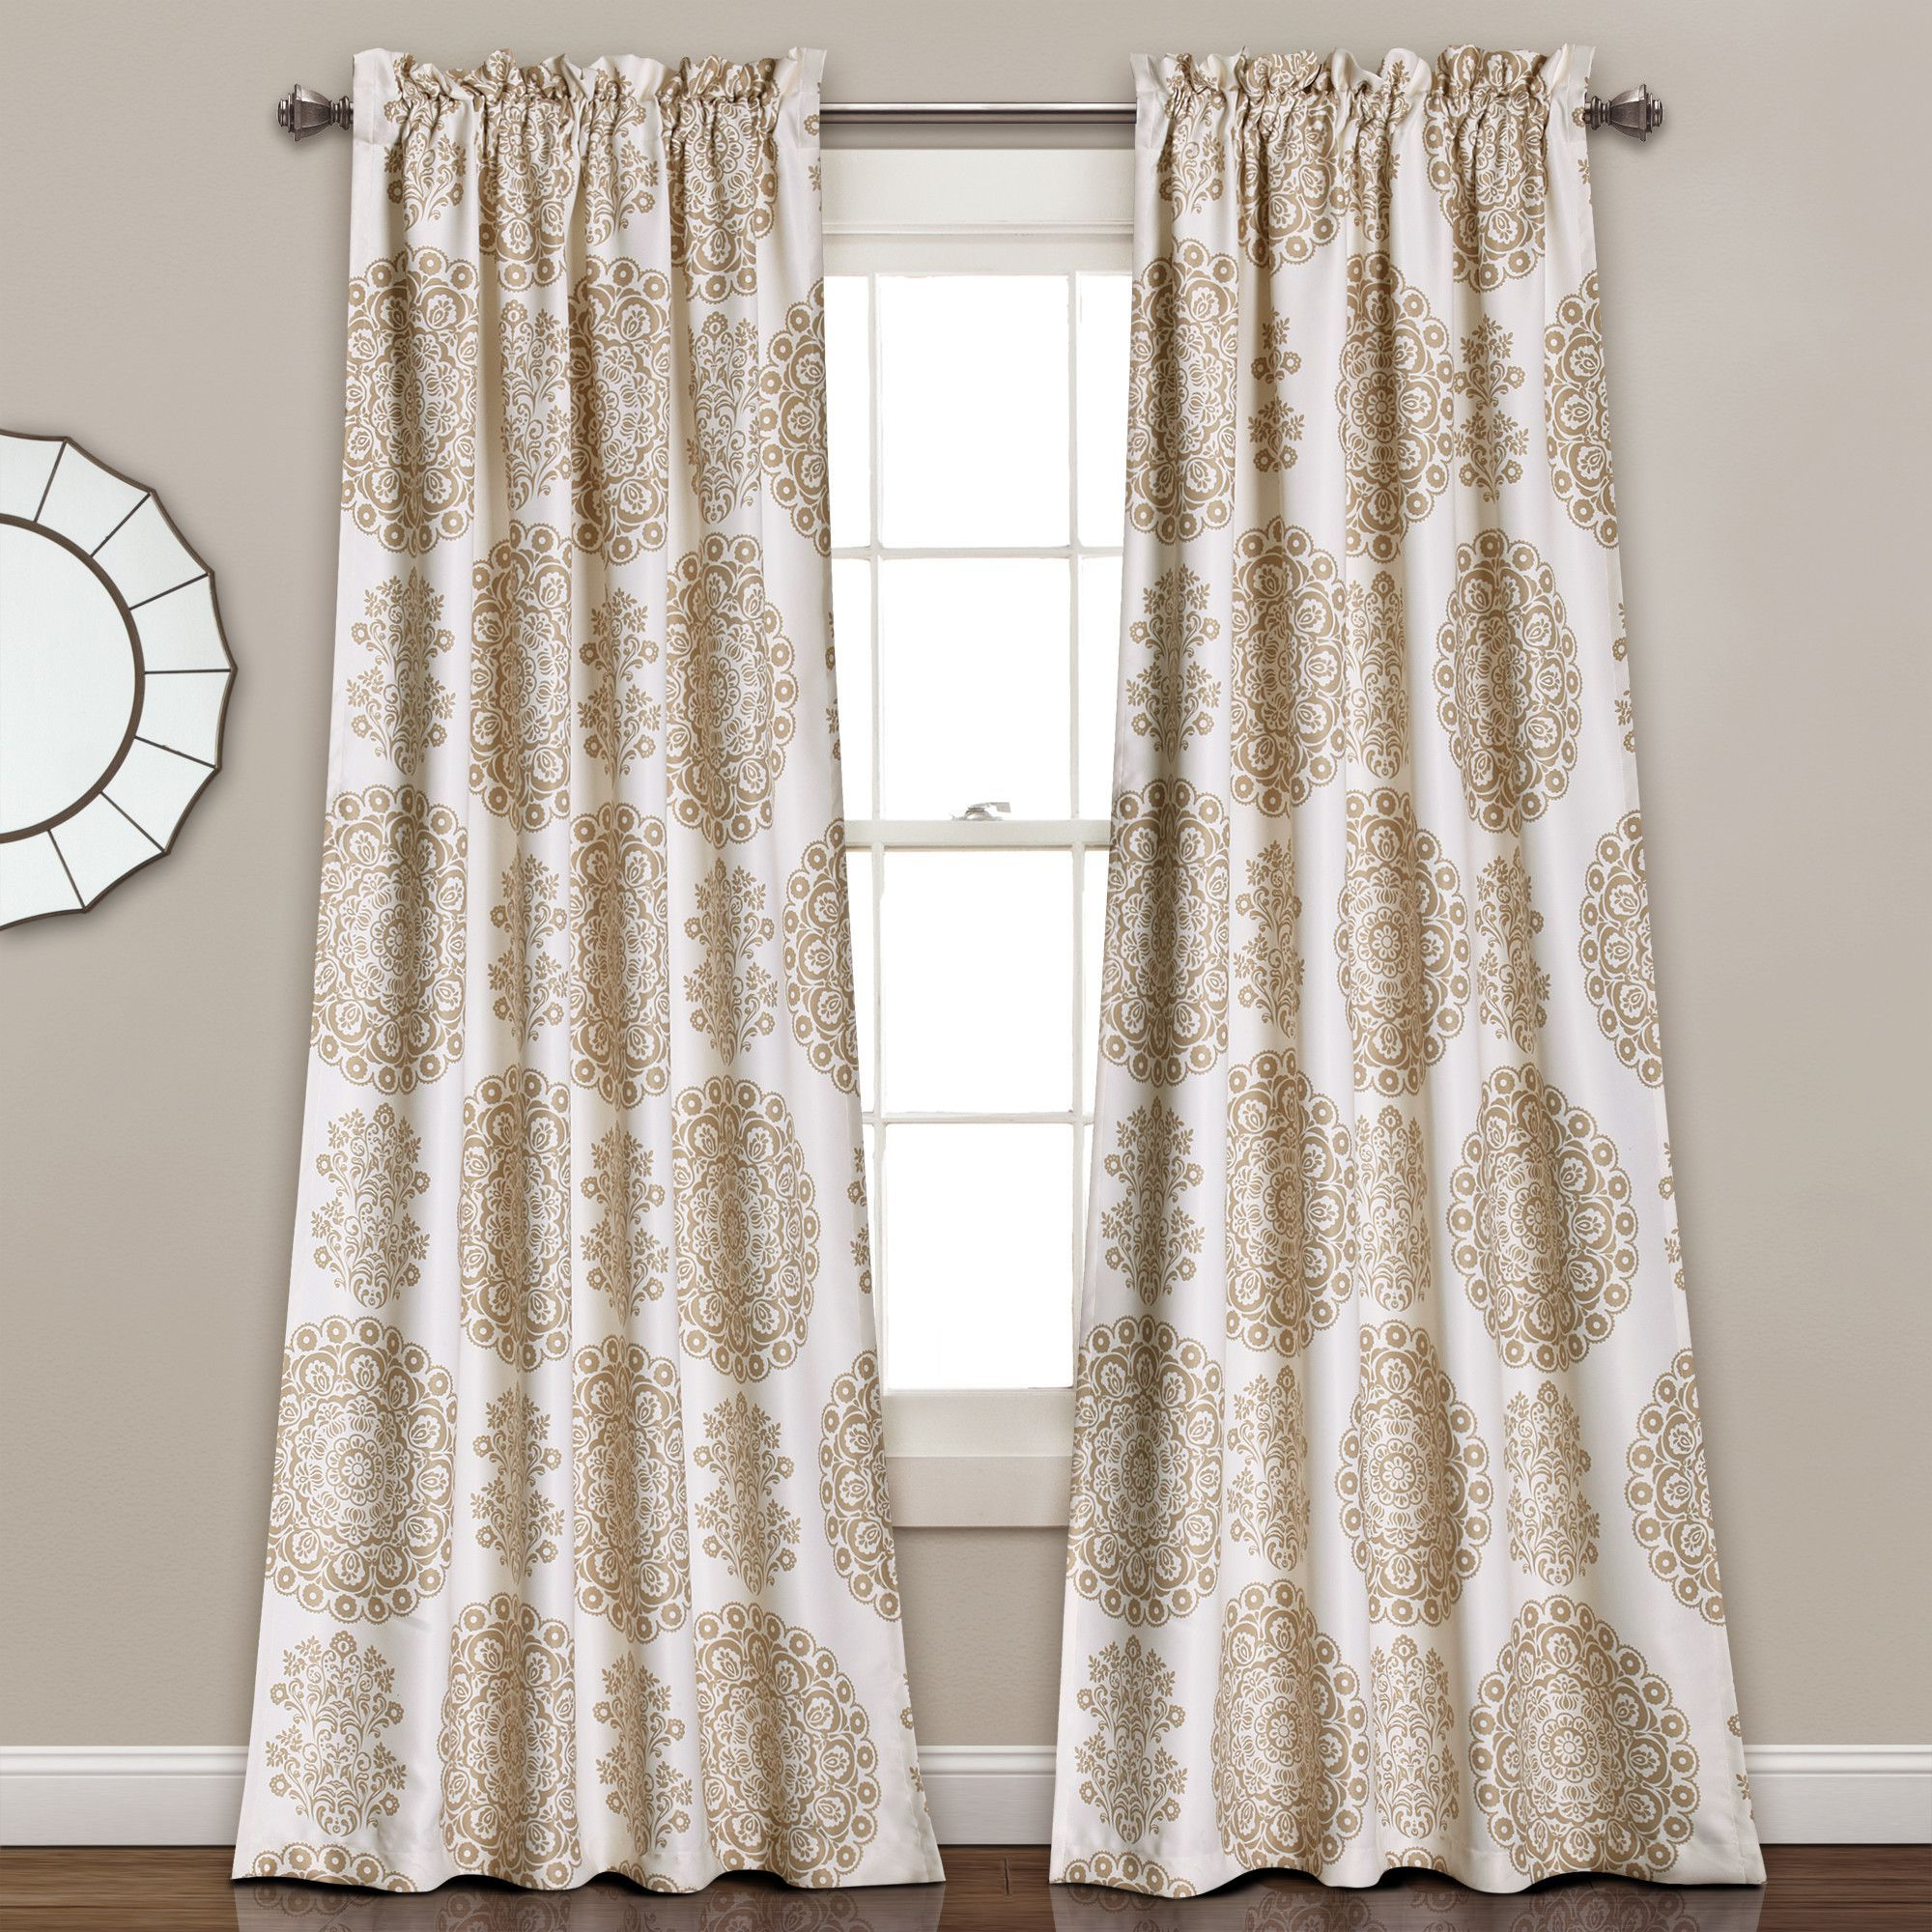 com curtains taizalo inch for walmart stylist kitchen choosed sensational